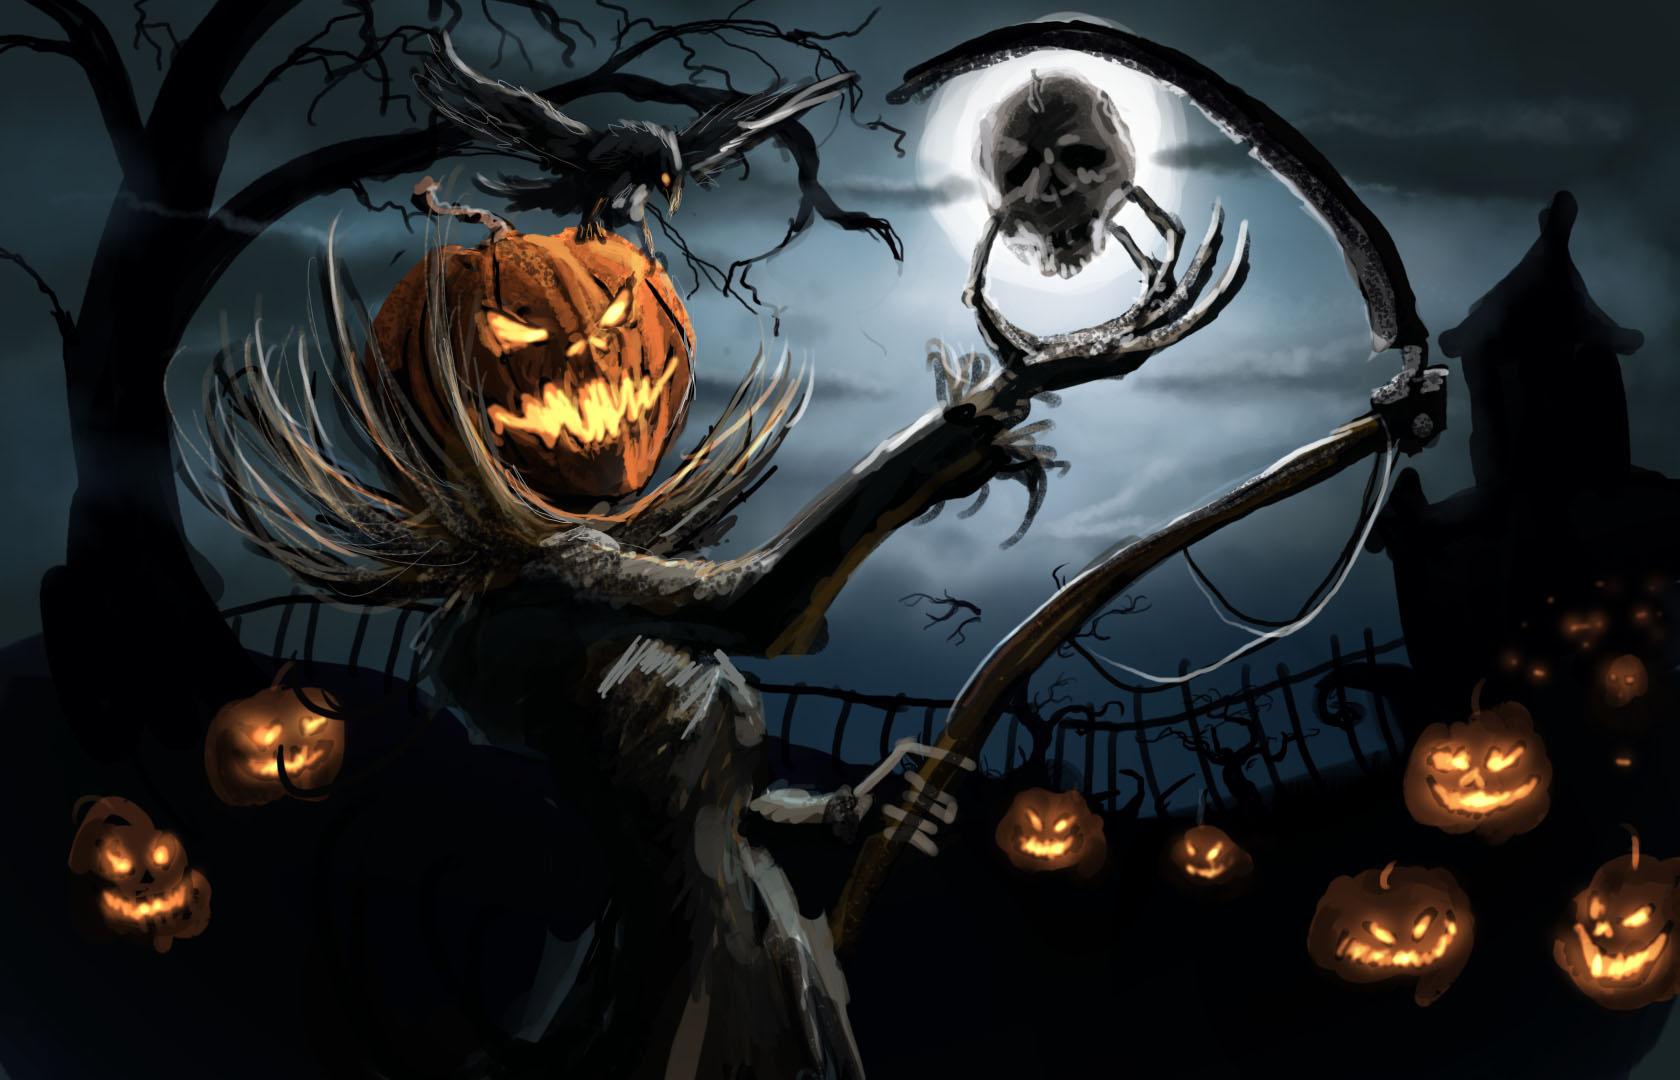 Free Scary Halloween Wallpaper - WallpaperSafari